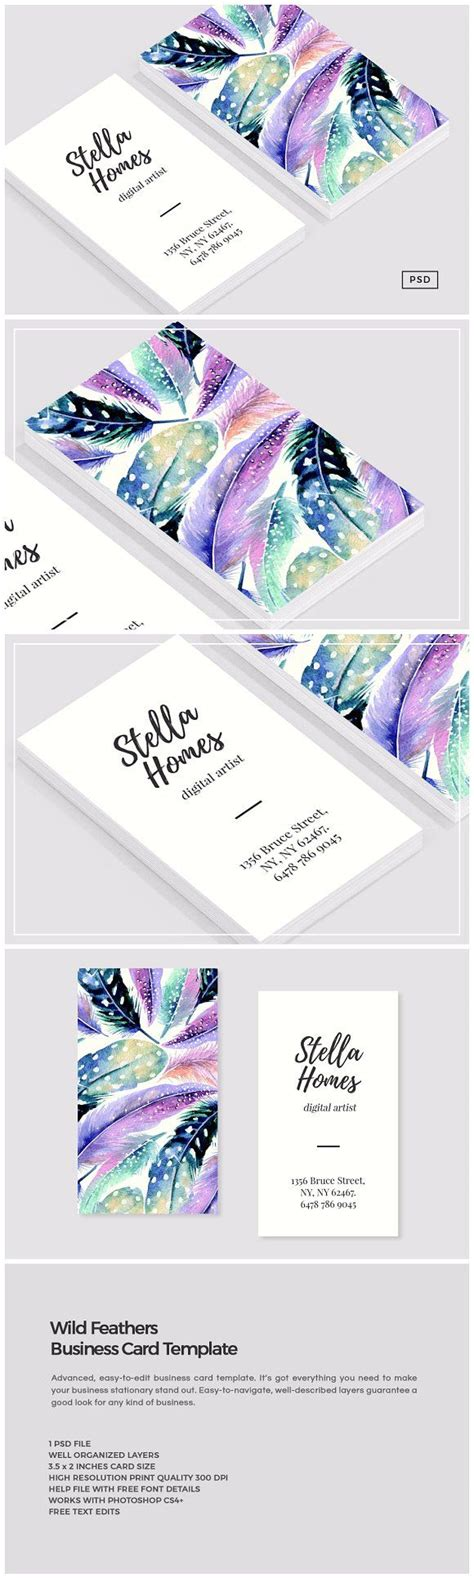 Wilde Business Card